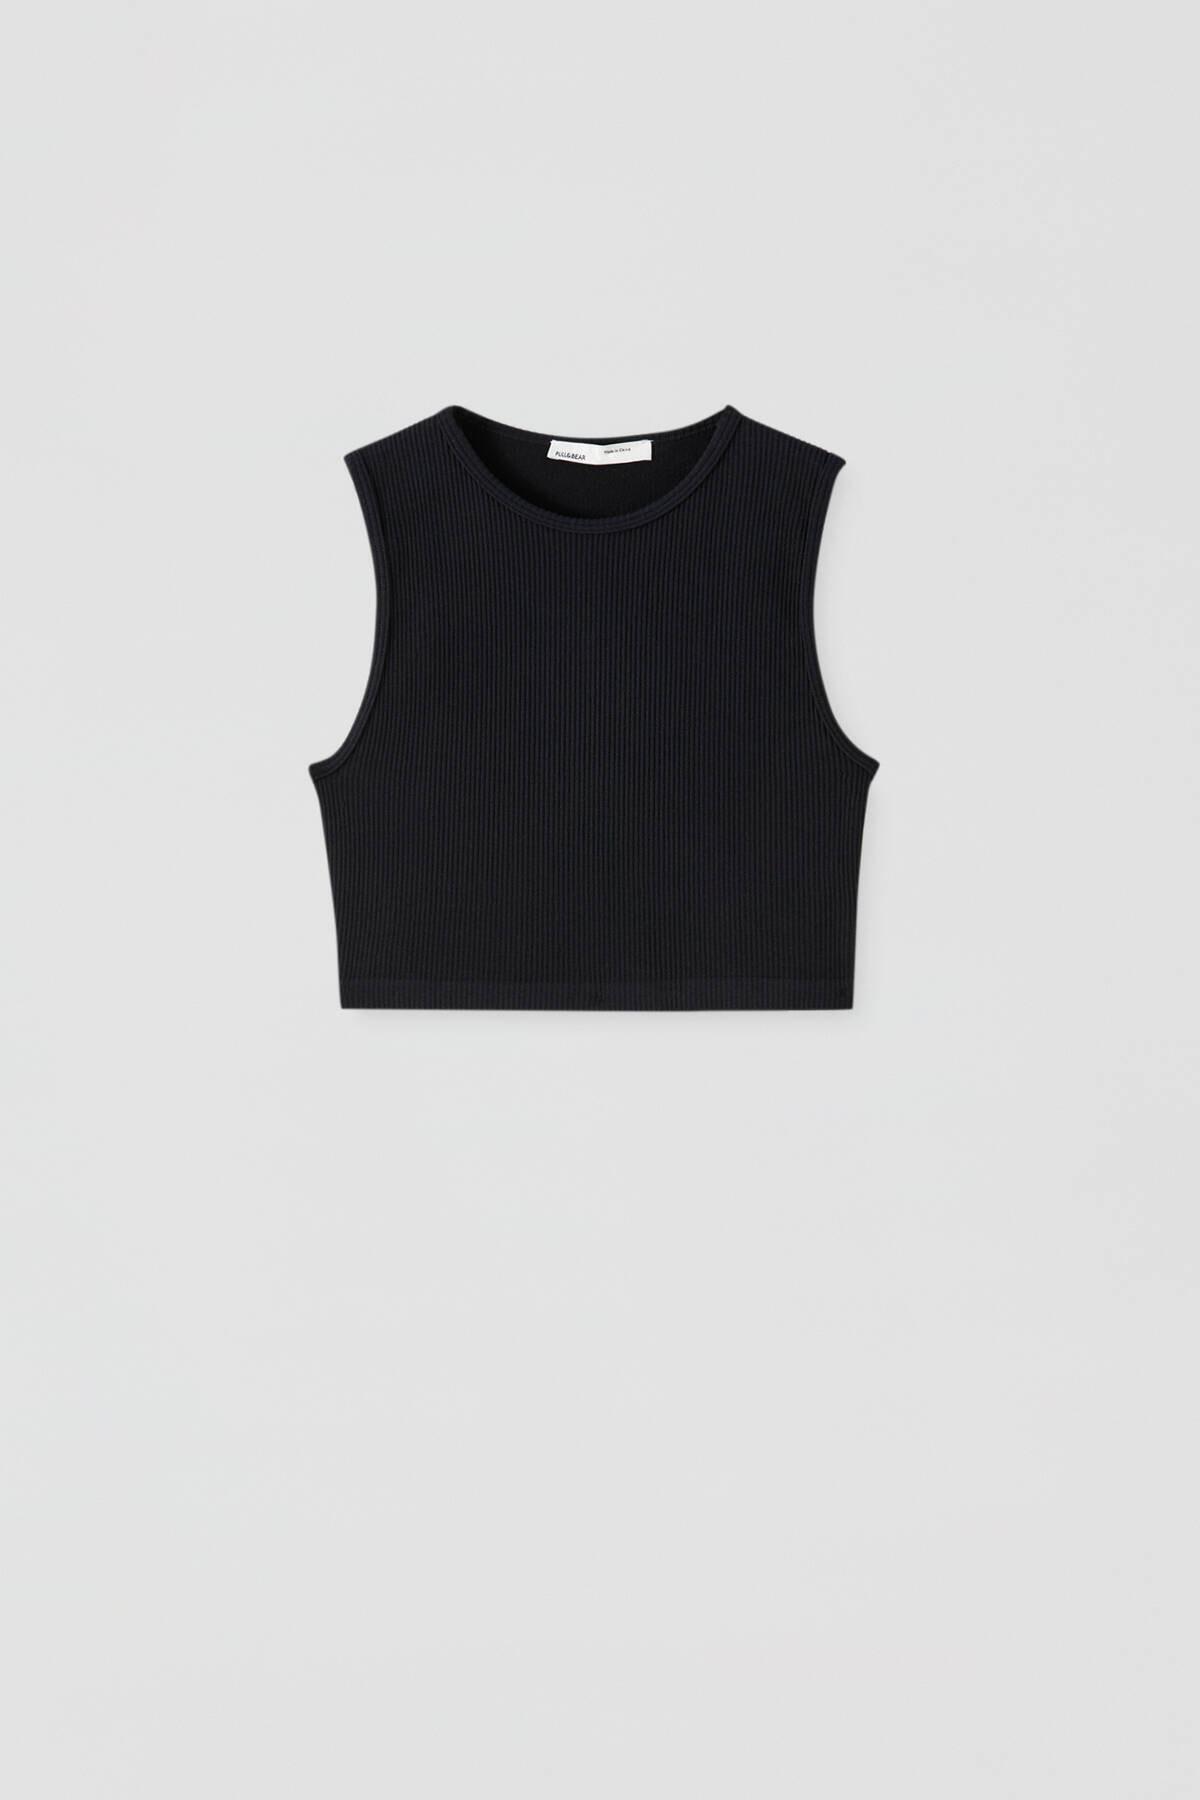 Pull & Bear Kadın Siyah Dikişsiz Kolsuz Basic Top 09247313 4